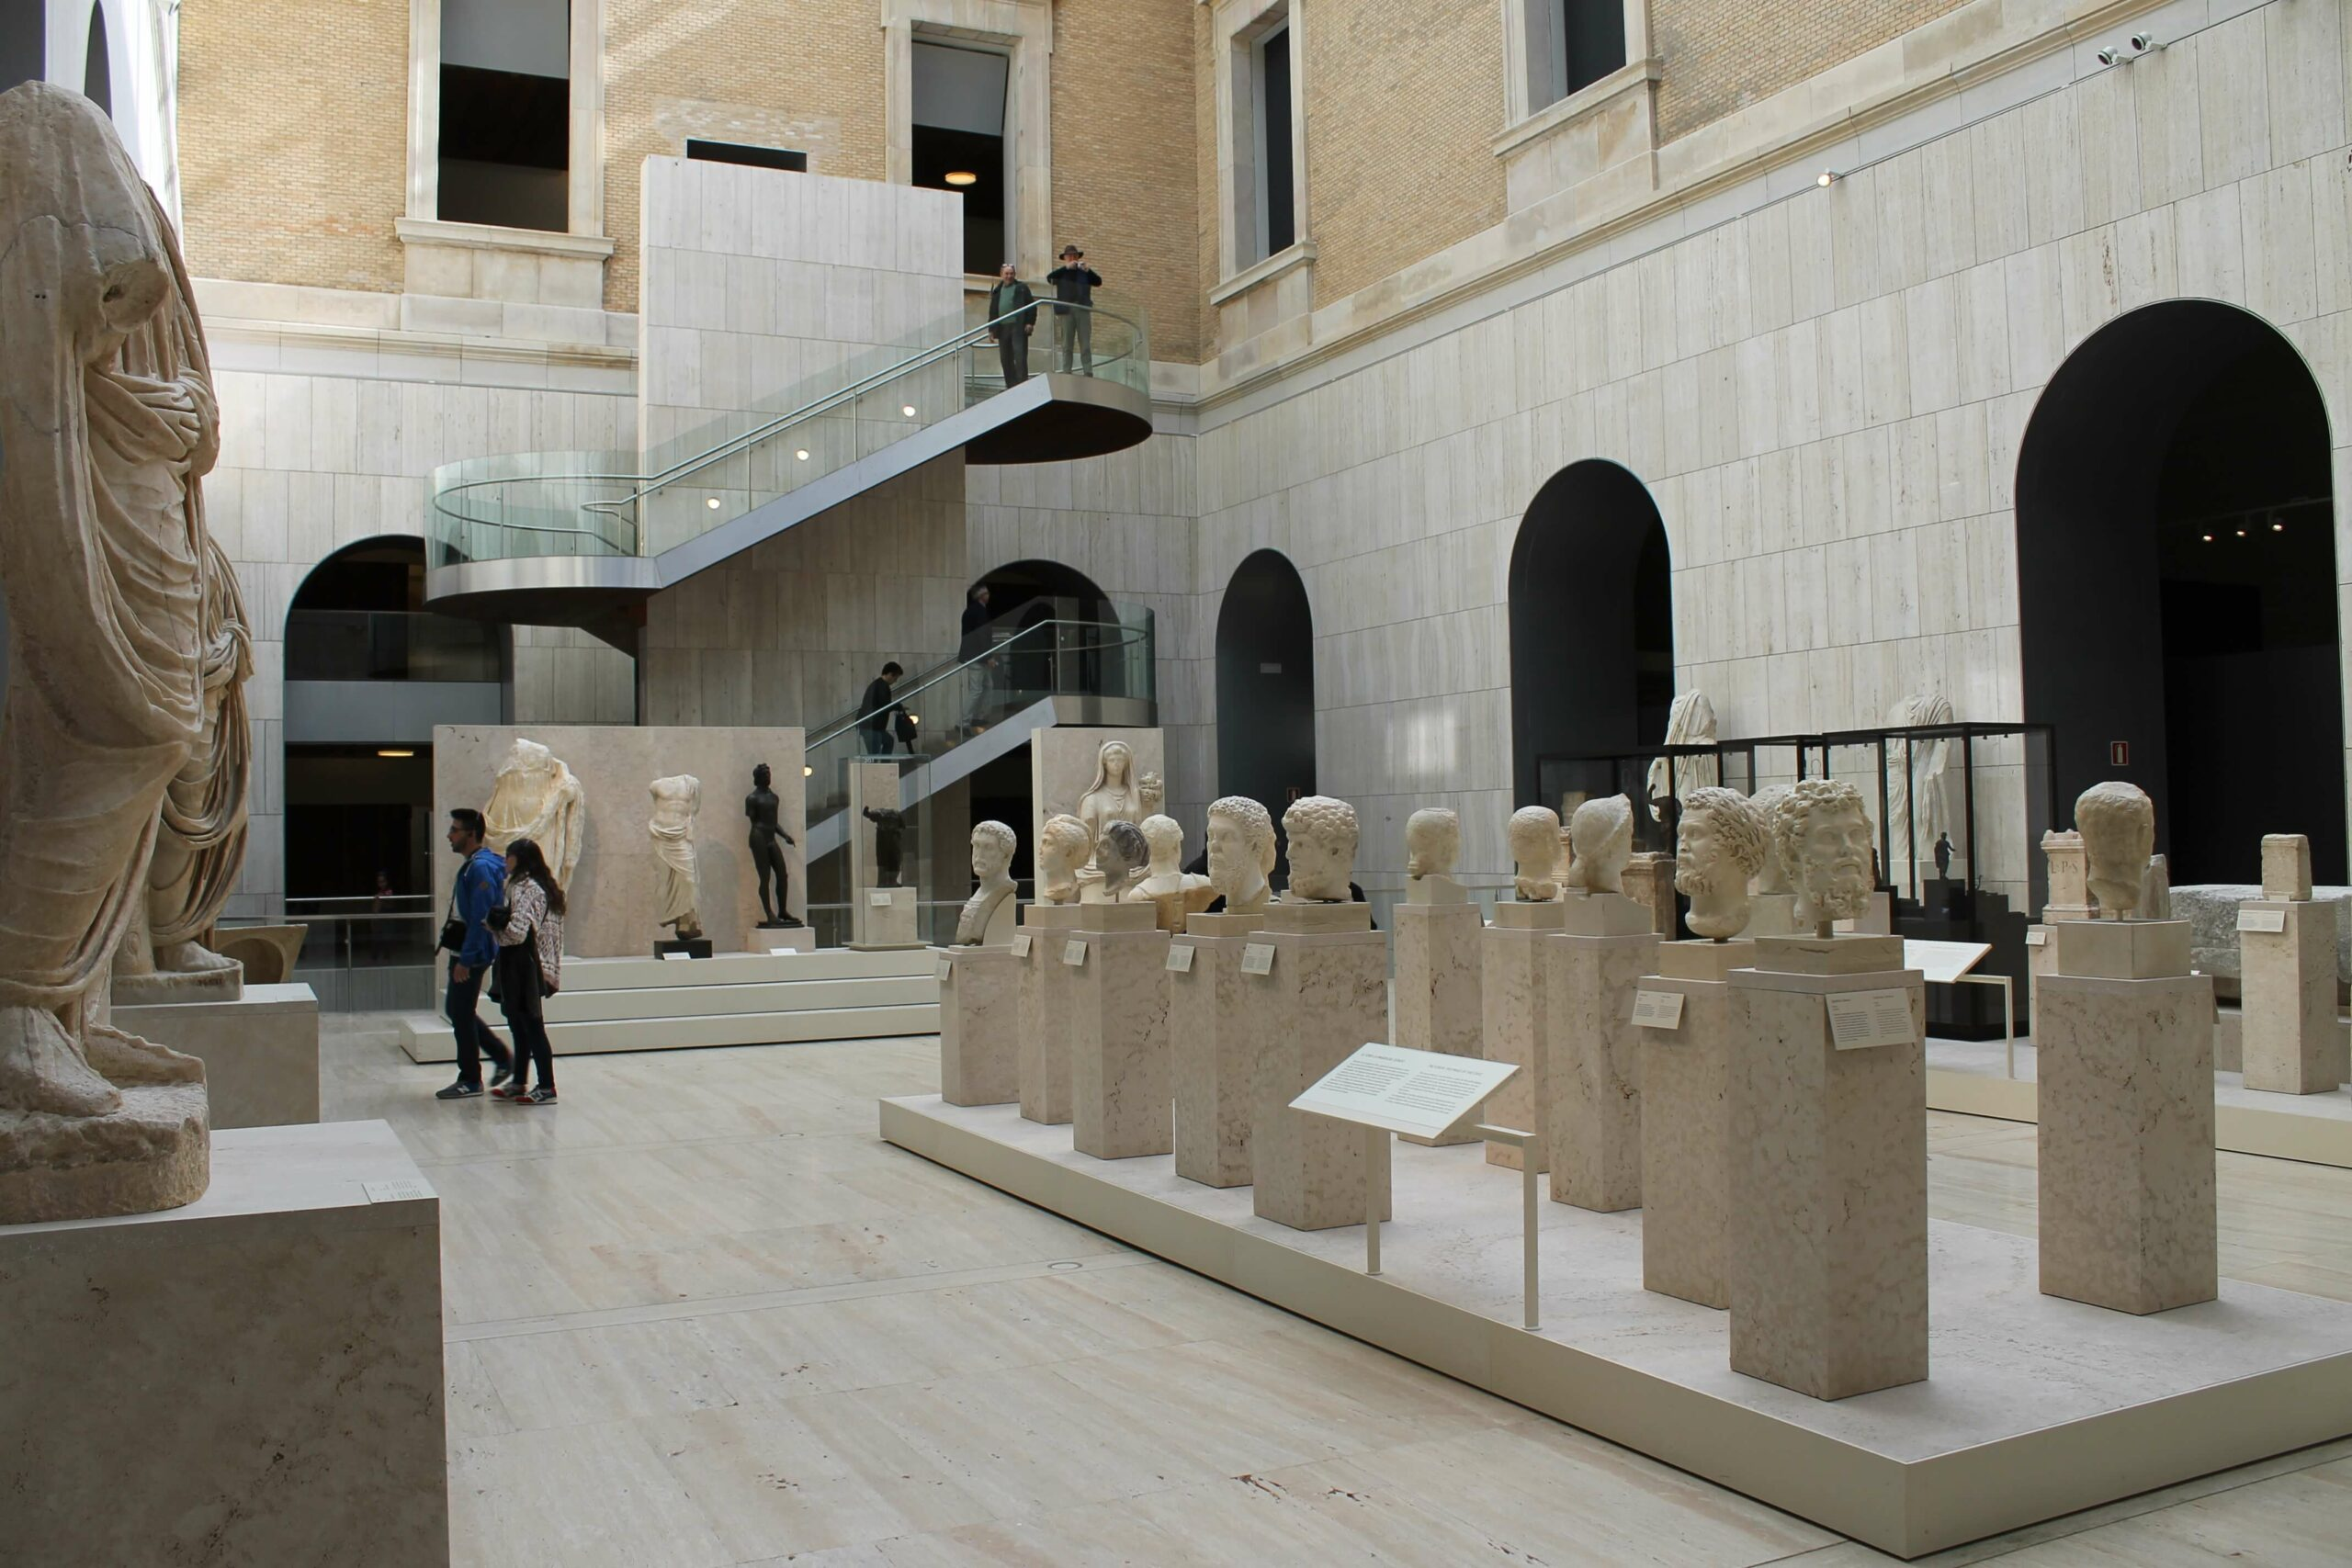 Gimkana museo Arqueologico Nacional Madrid